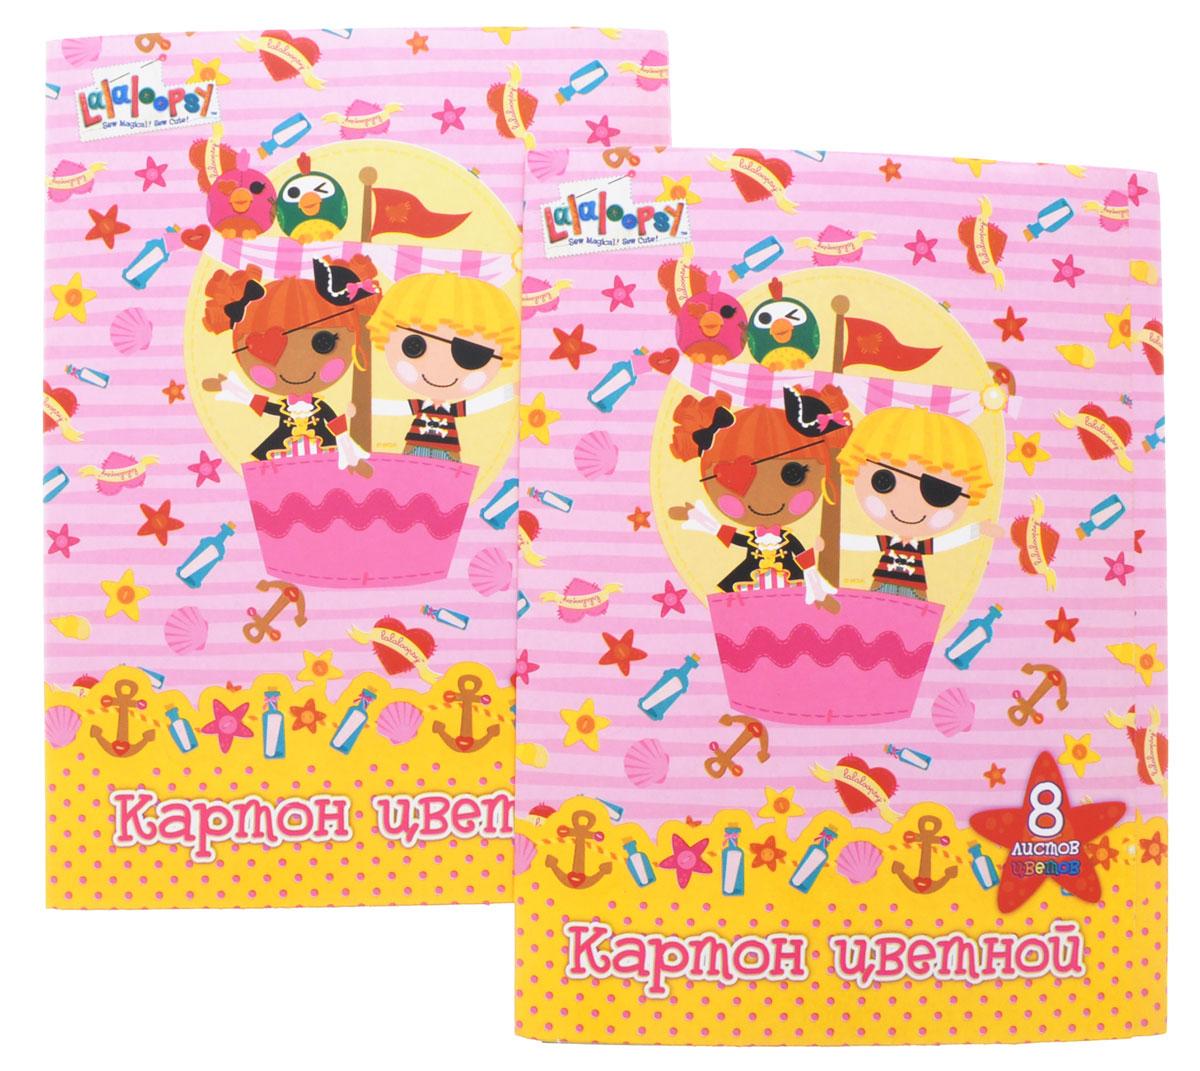 Action! Набор цветного картона Lalaloopsy 8 листов цвет розовый 2 шт action набор цветного картона strawberry shortcake 8 листов 2 шт